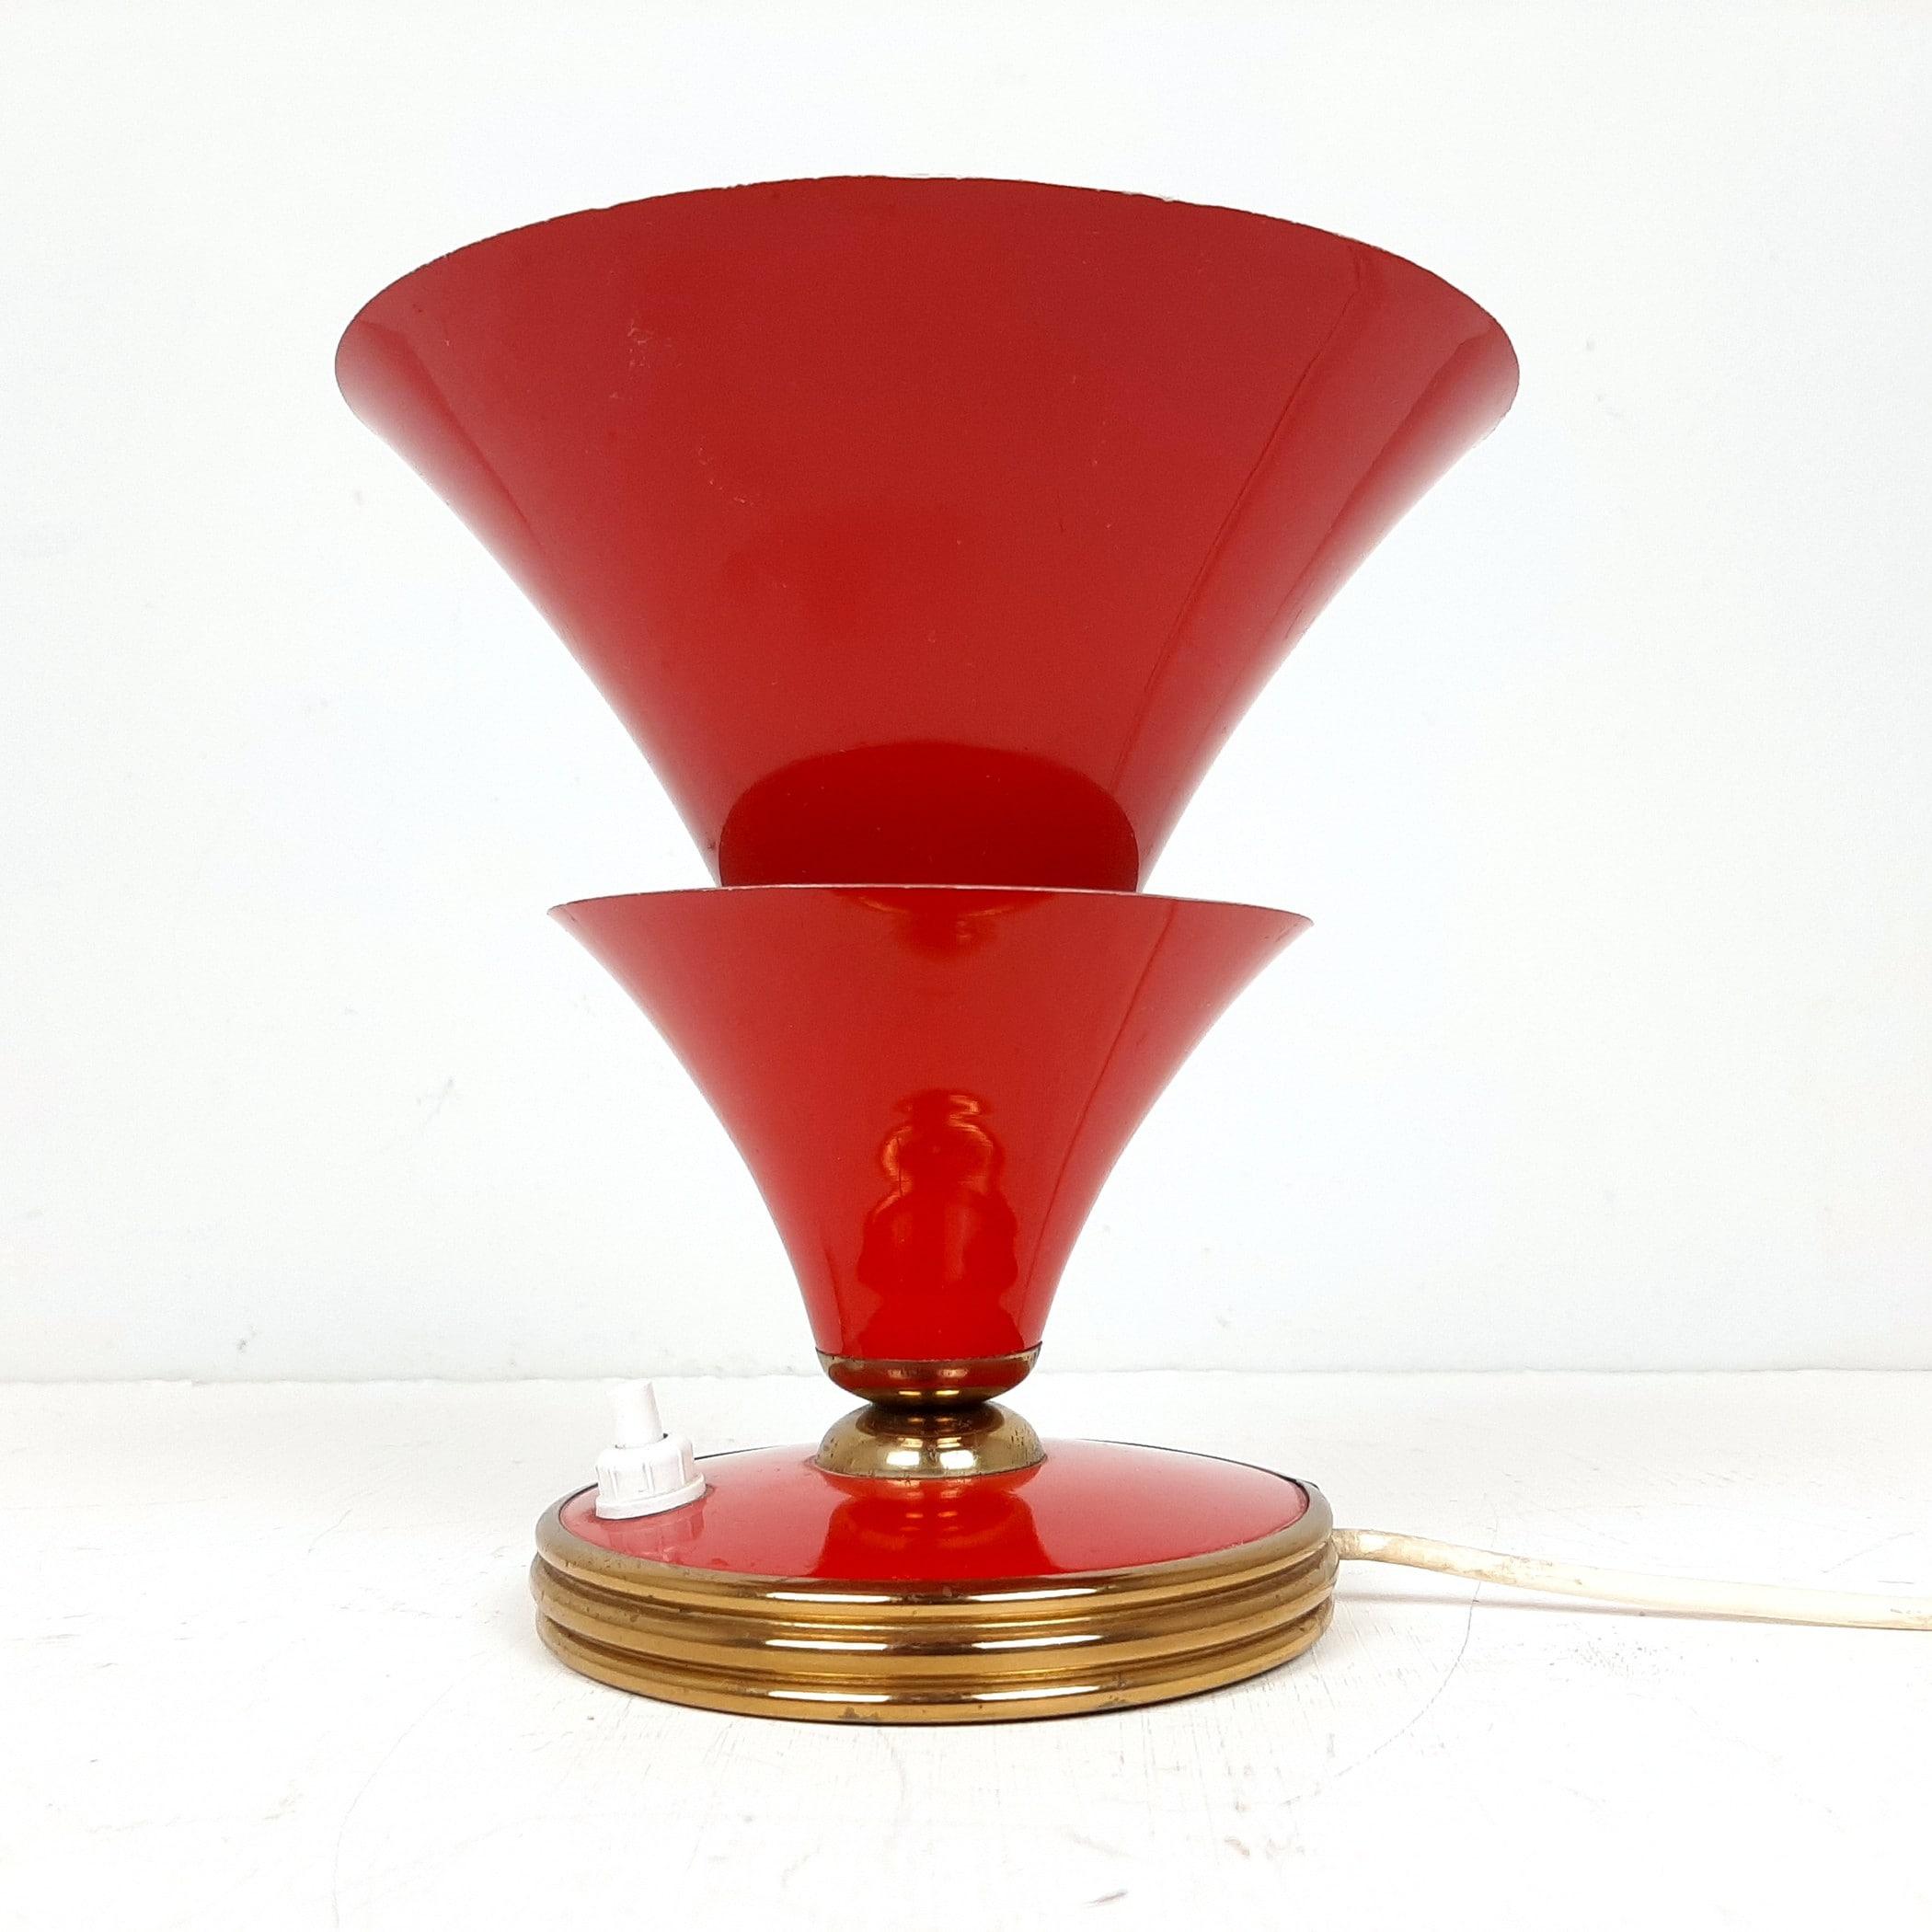 Vintage red table lamp Italy 50s Stilnovo era Mid-century design Modern enameled metal cone lamp